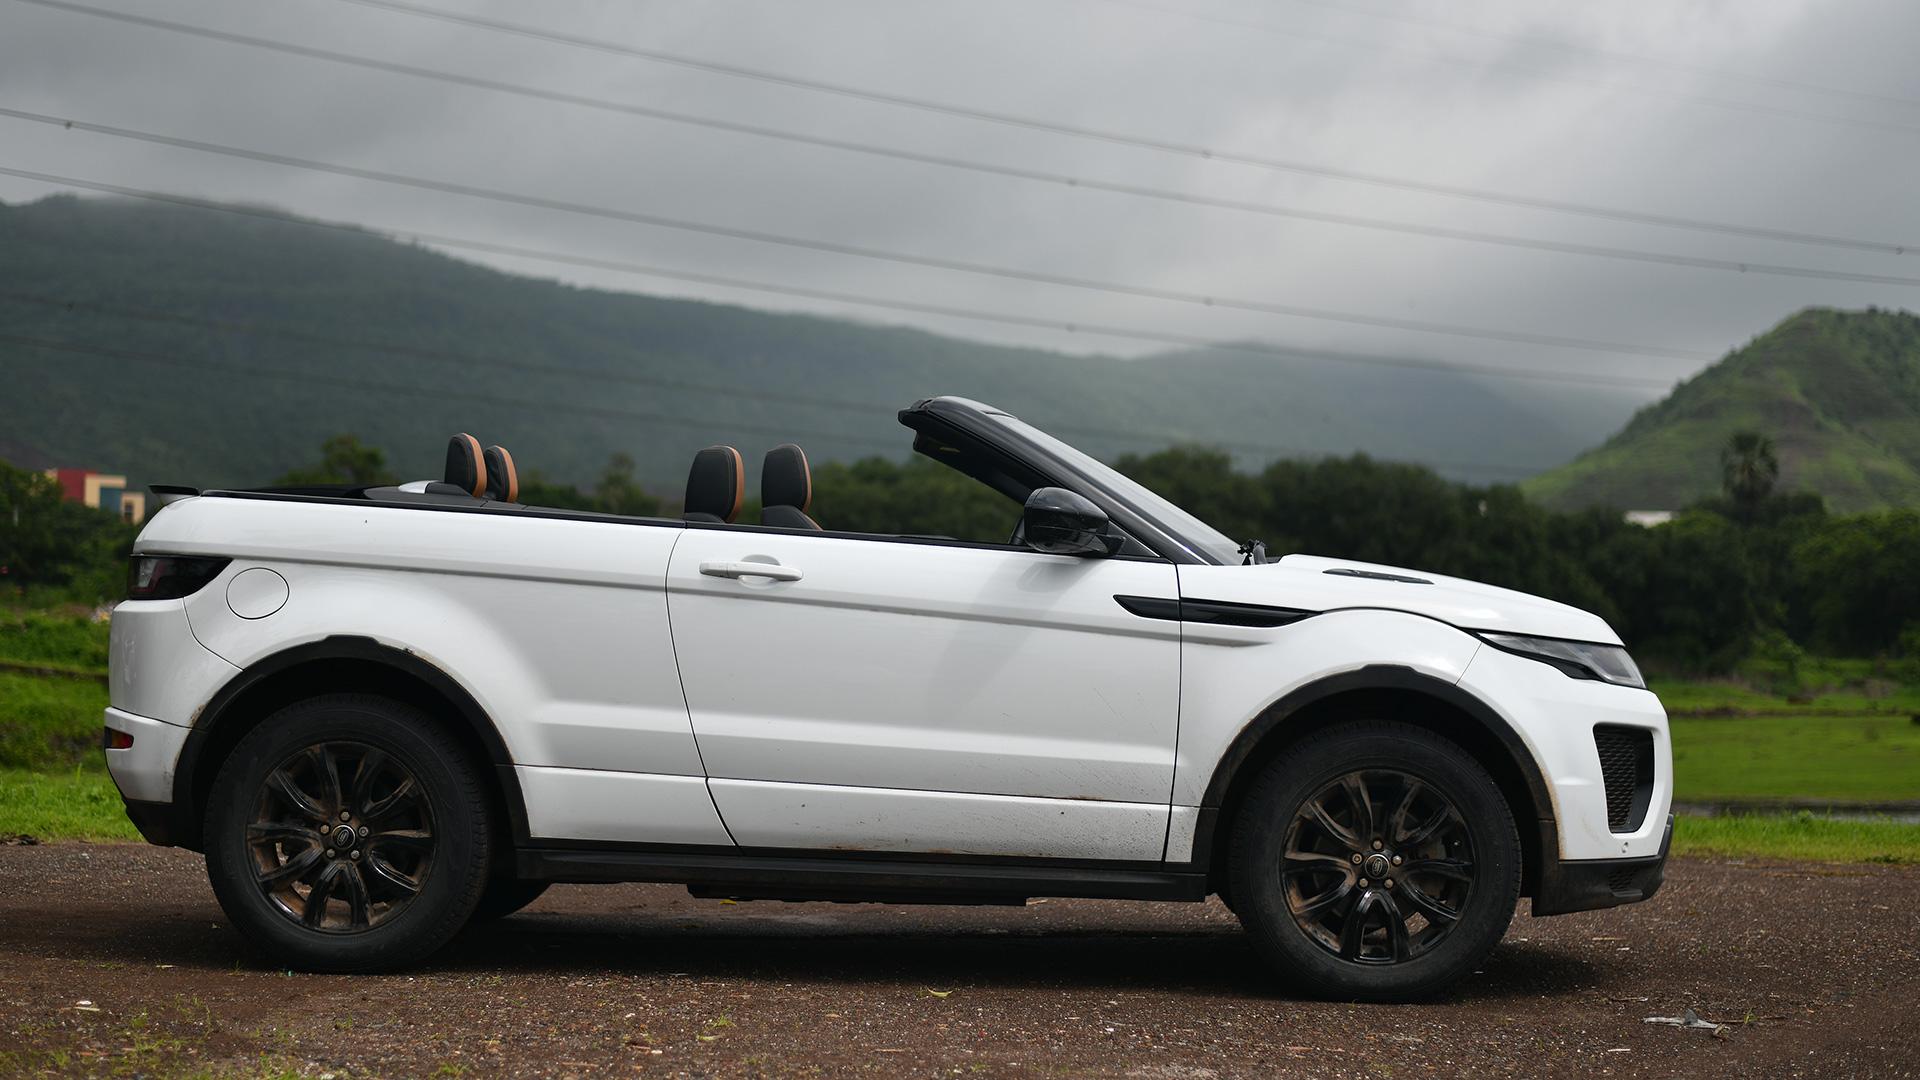 Land Rover Range Rover Evoque Convertible 2018 Price Mileage